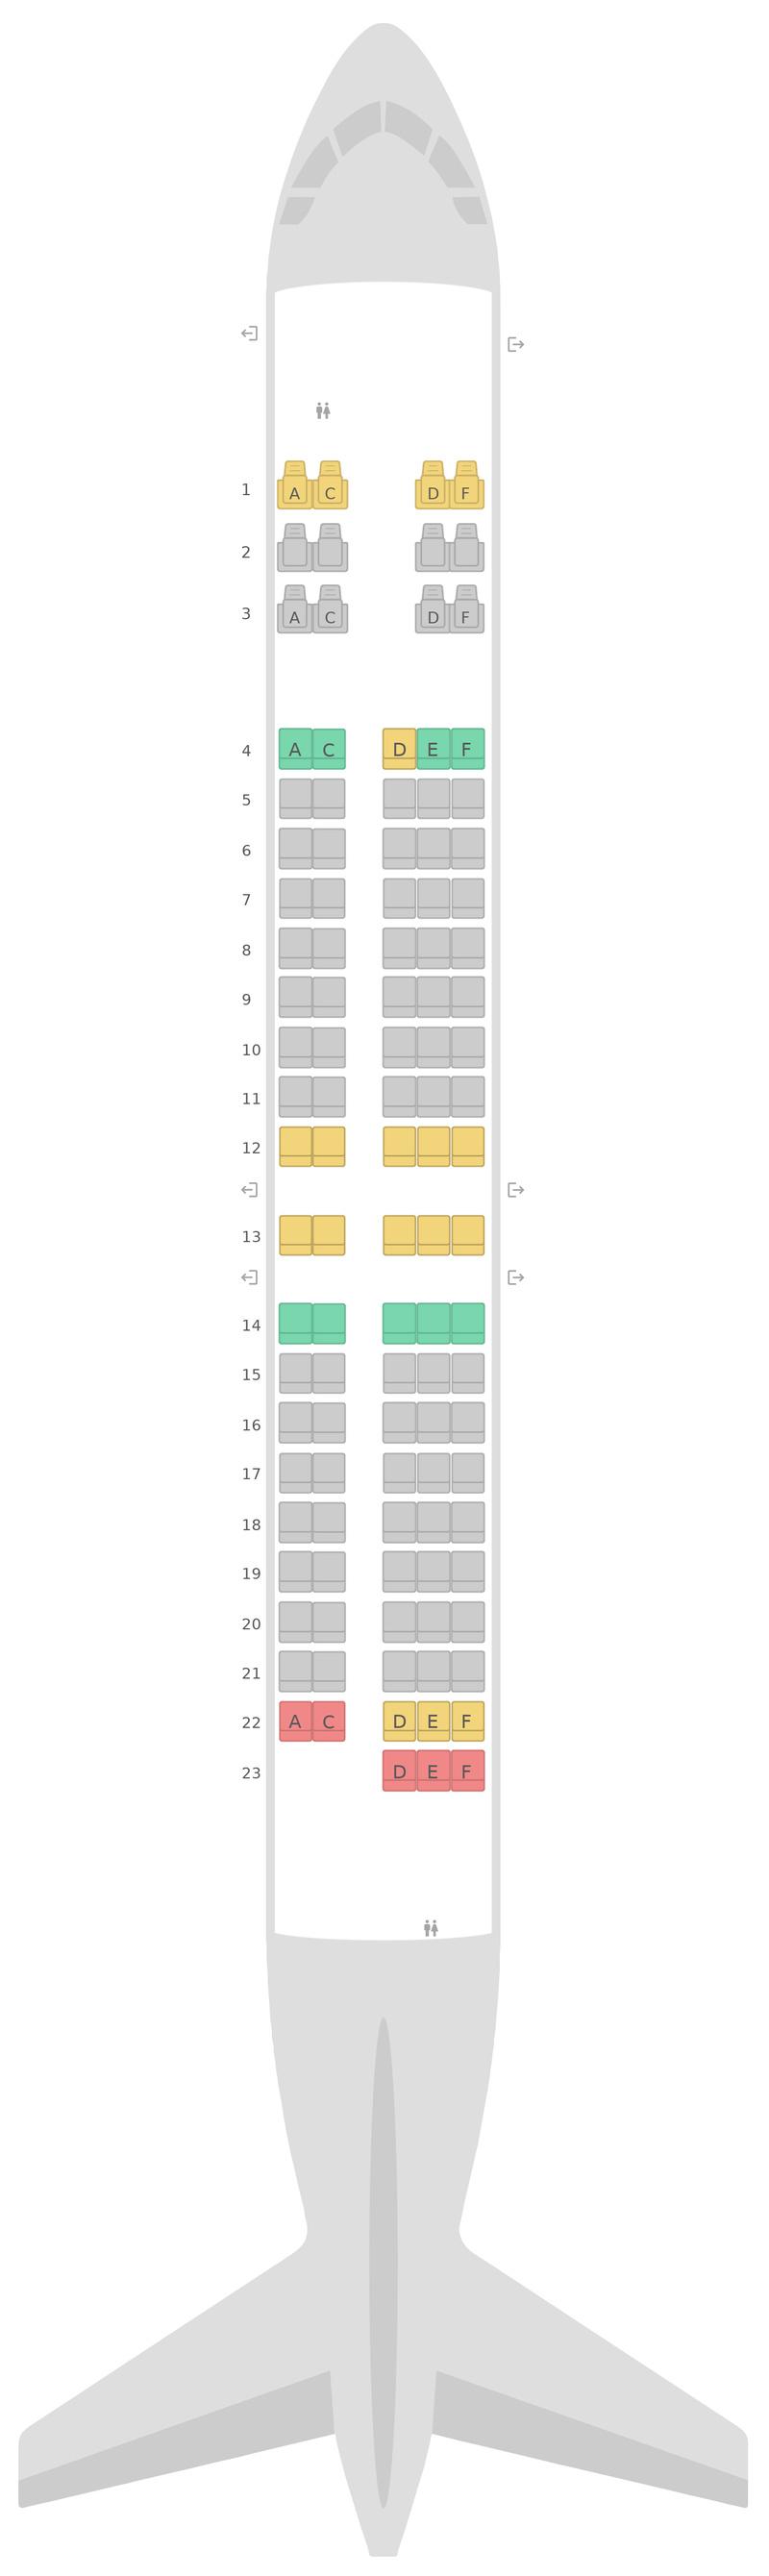 Mapa de asientos Boeing 717-200 2 Class Qantas